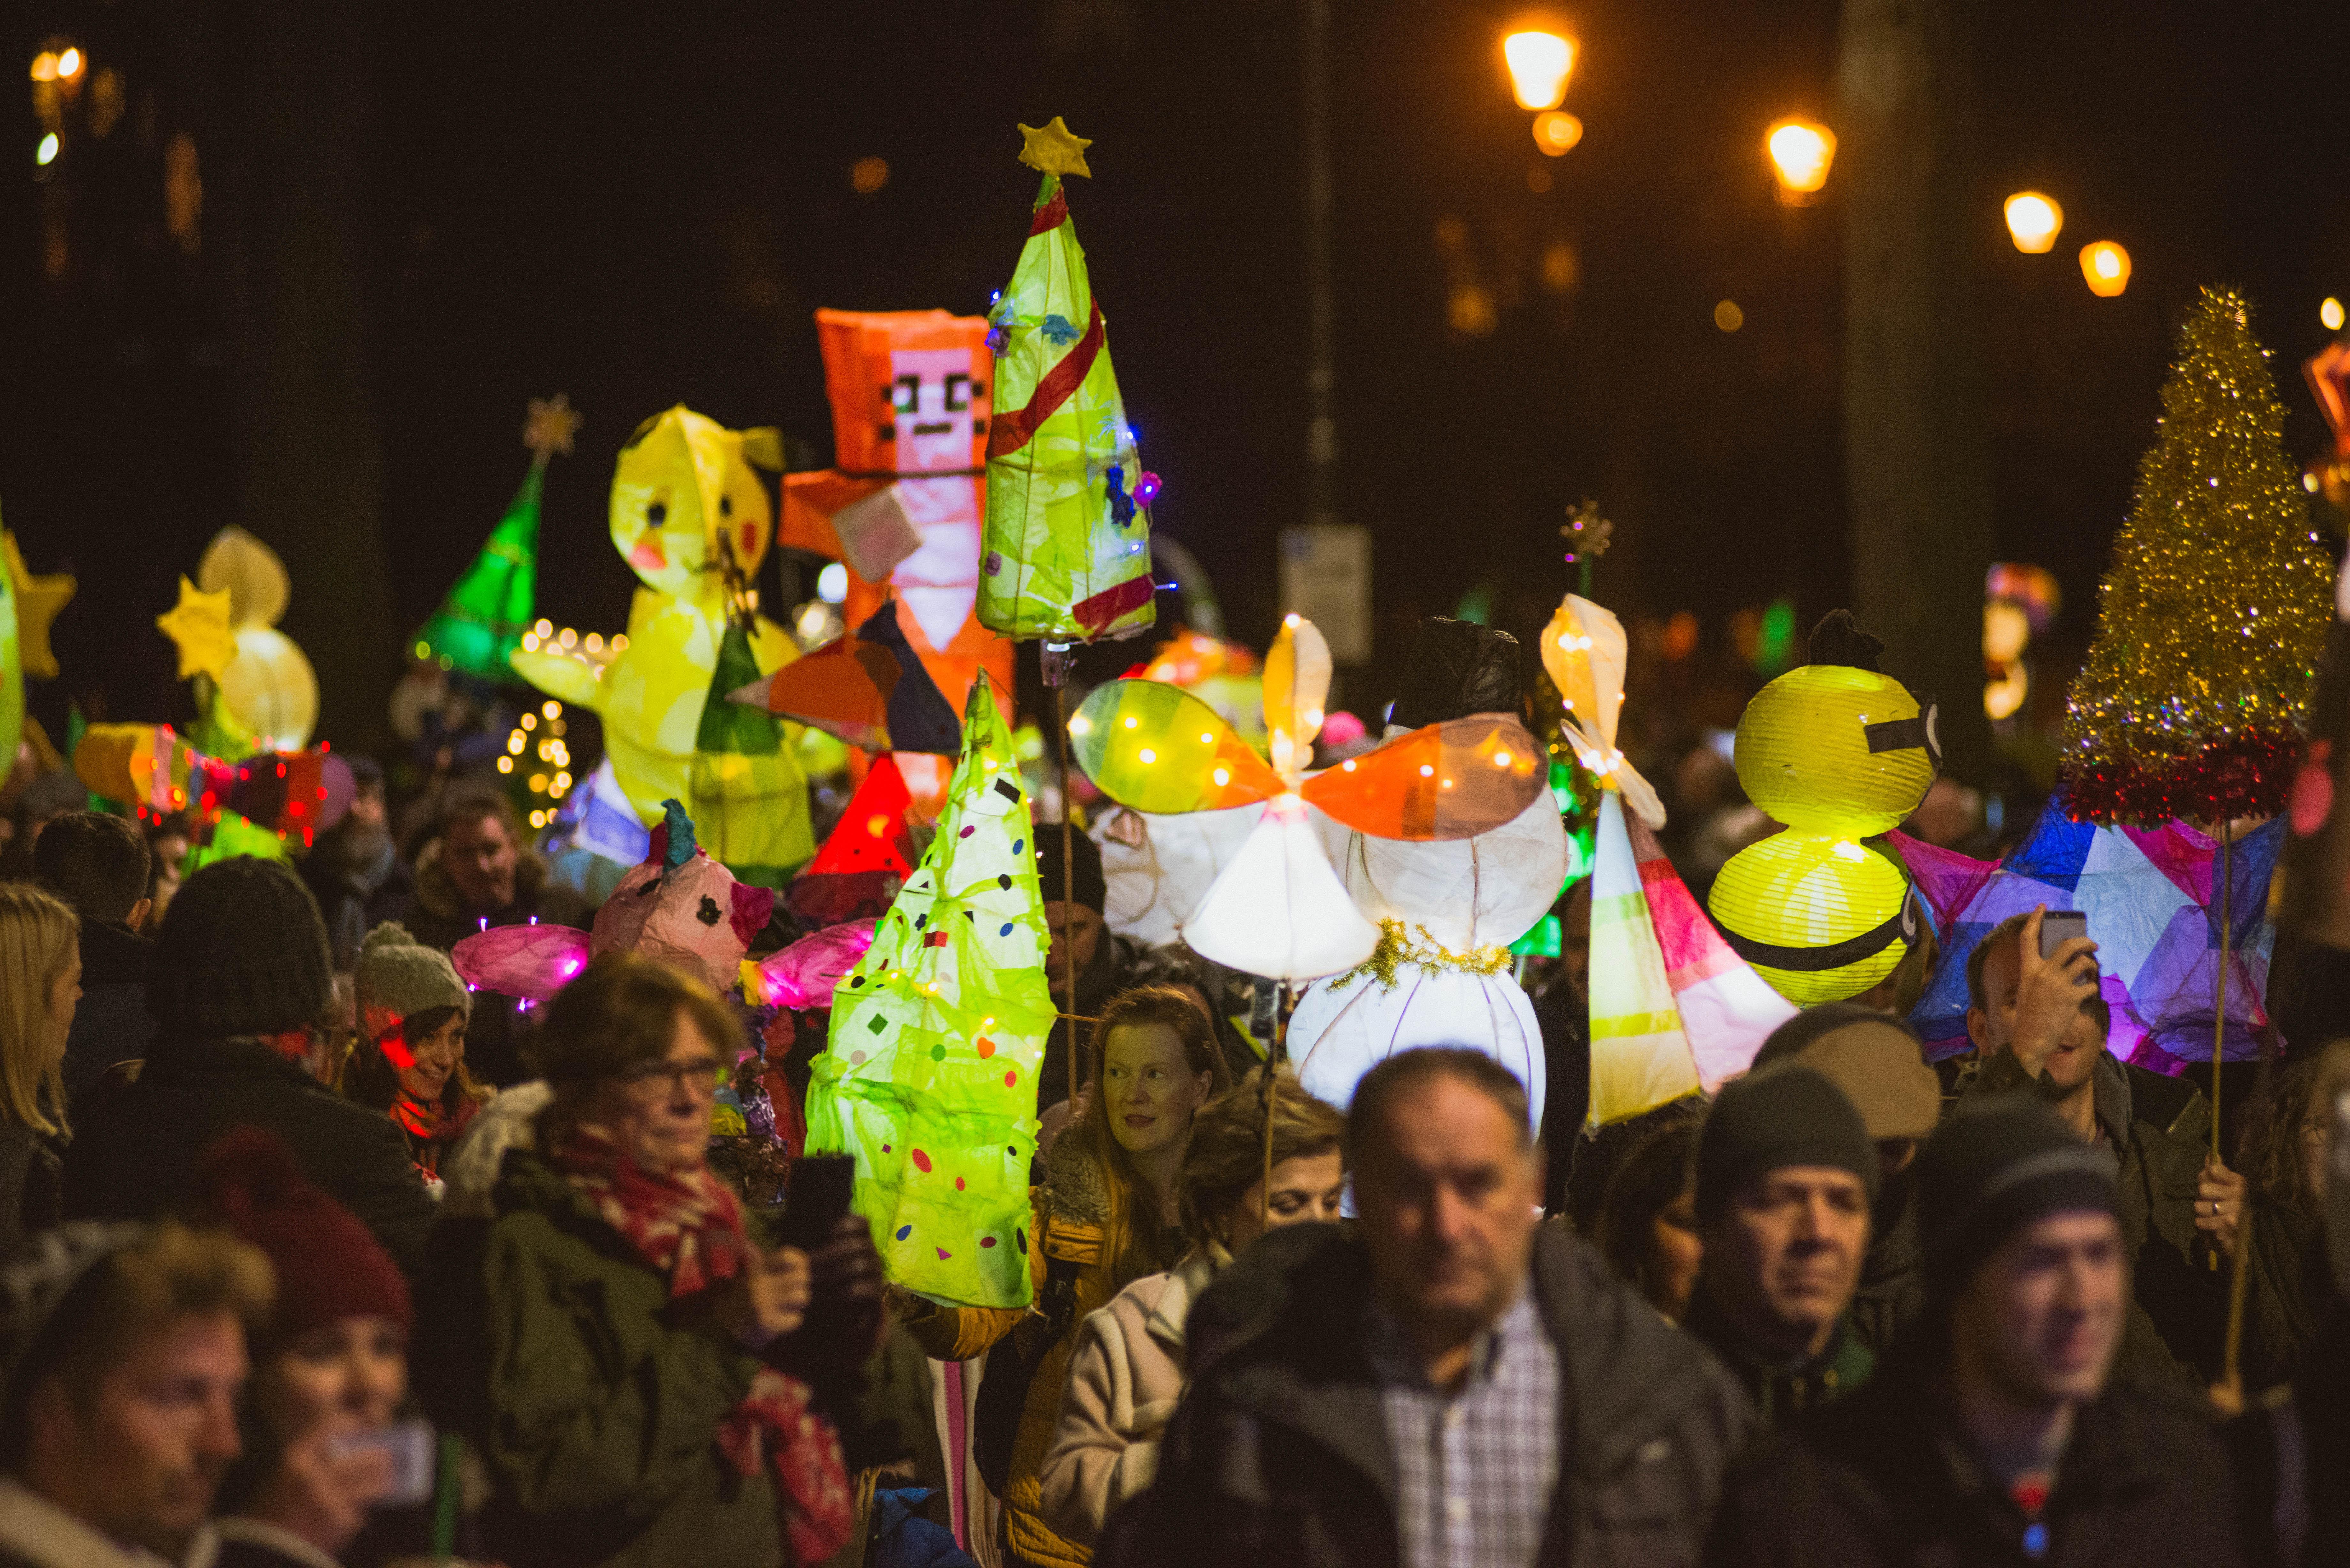 AA_Leam Lantern Parade 2017-43